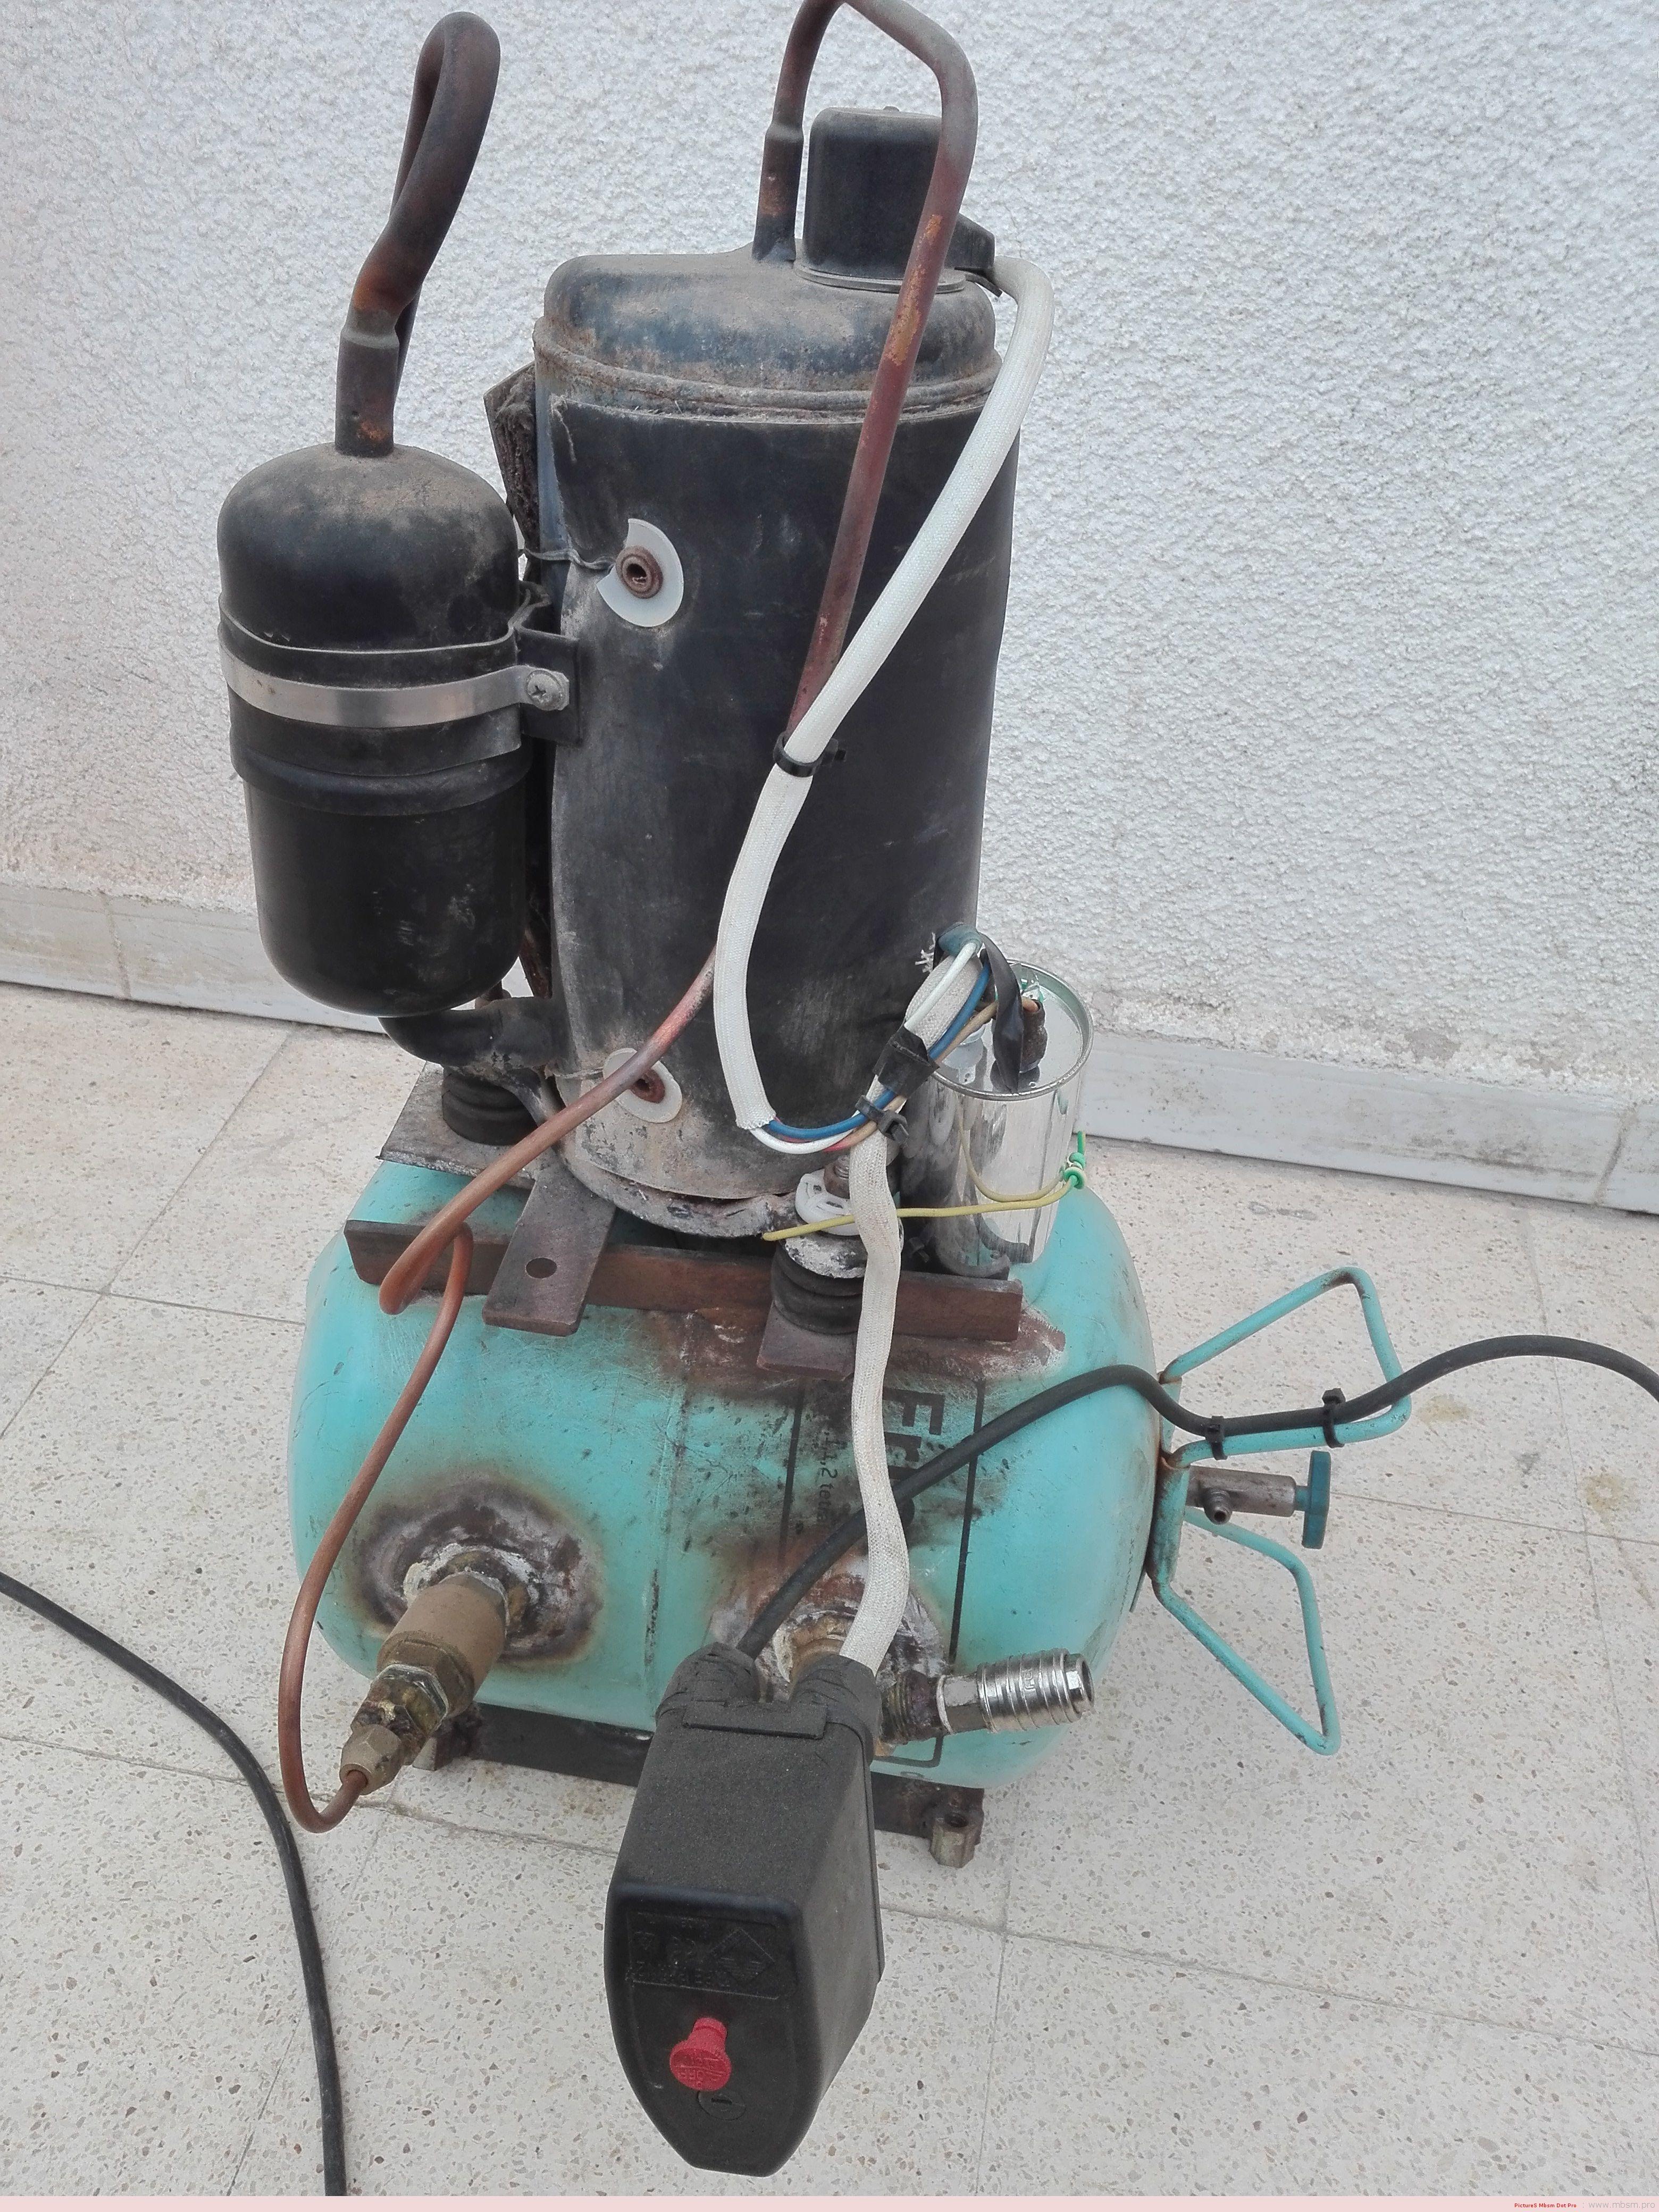 mbsm-dot-pro-invention--compresseur-dair-24-bar--wwwmbsmpro